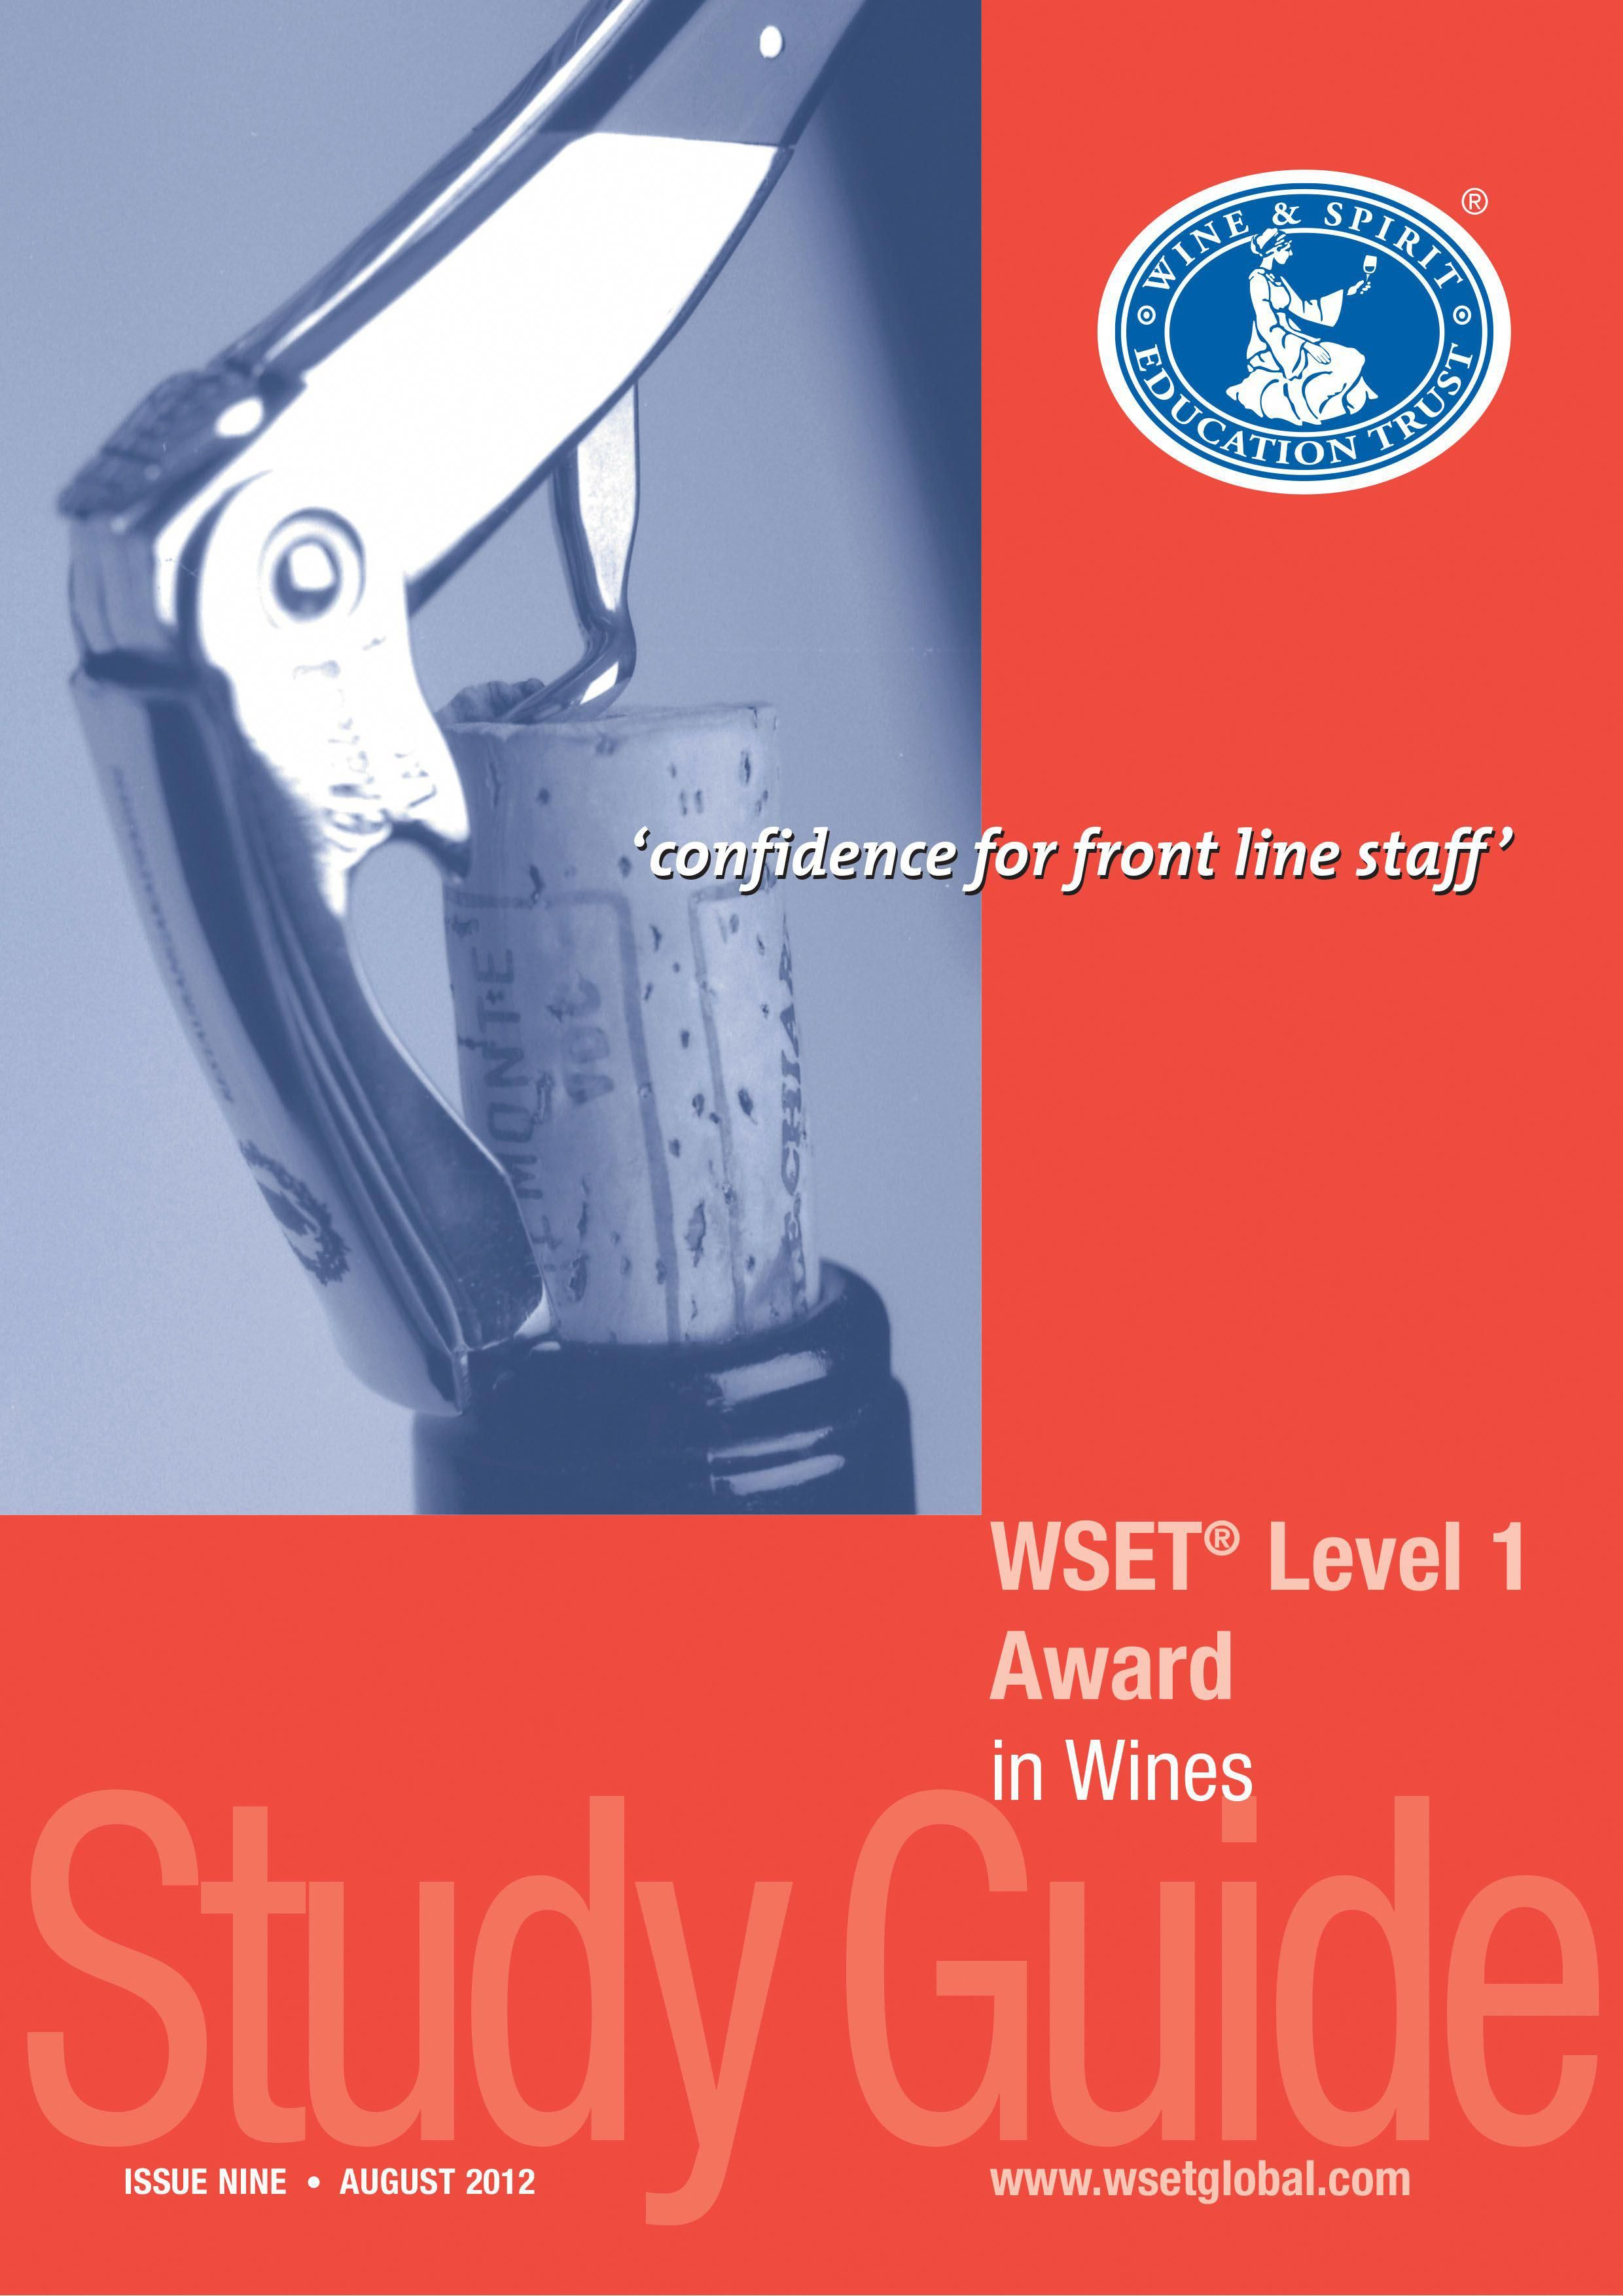 2winebottlegiftbag Code 5288507852 Wine Course Wine Tasting Course Wine Education